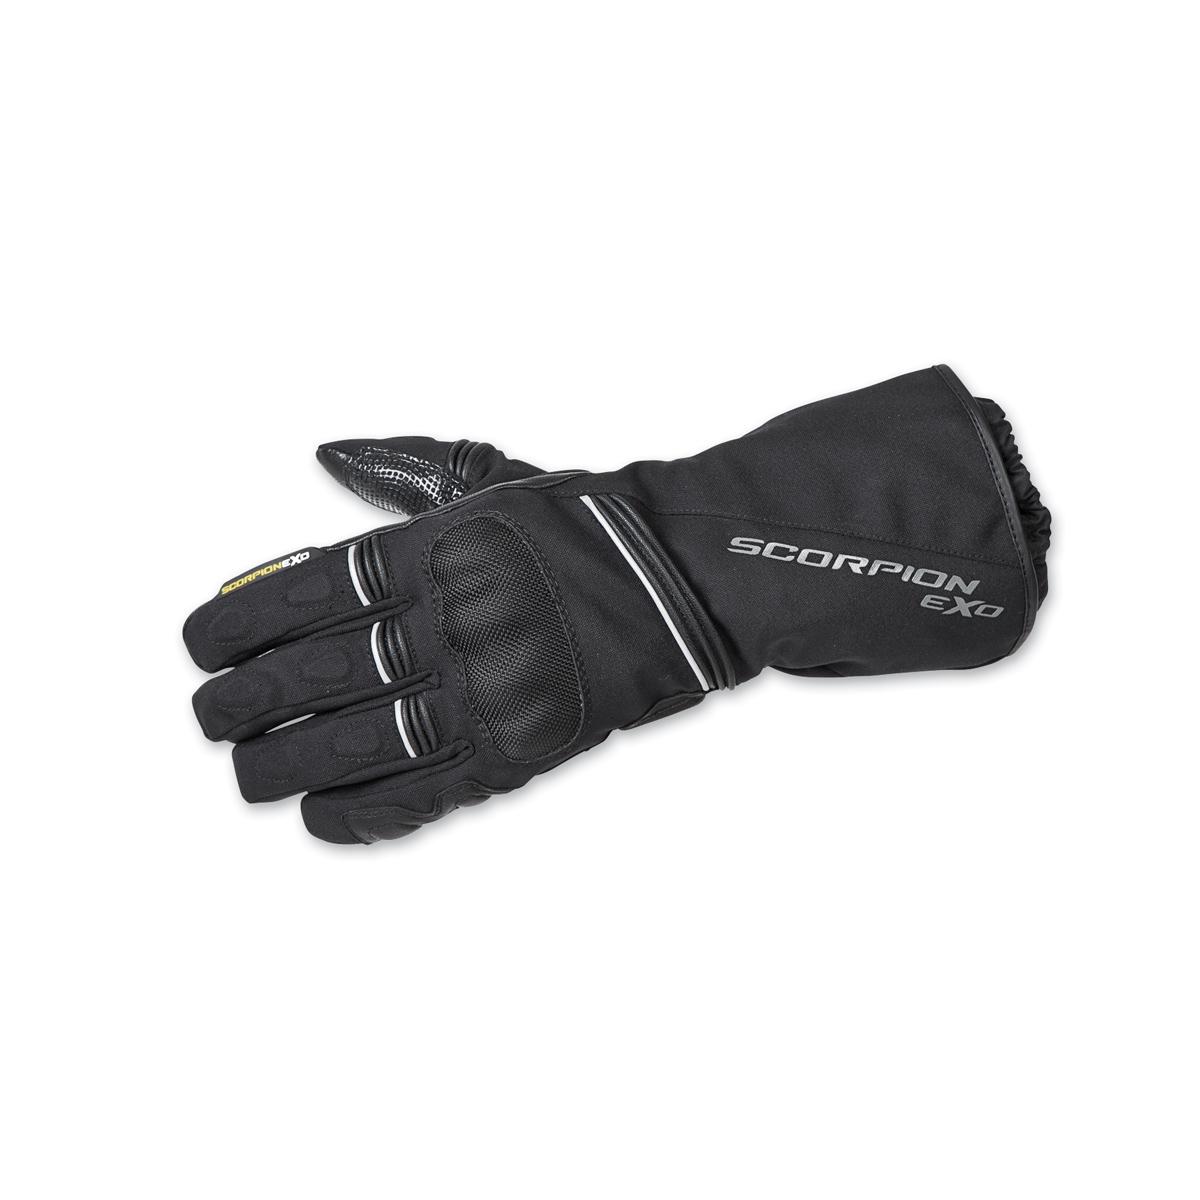 Scorpion EXO Men's Tempest Waterproof Black Gloves